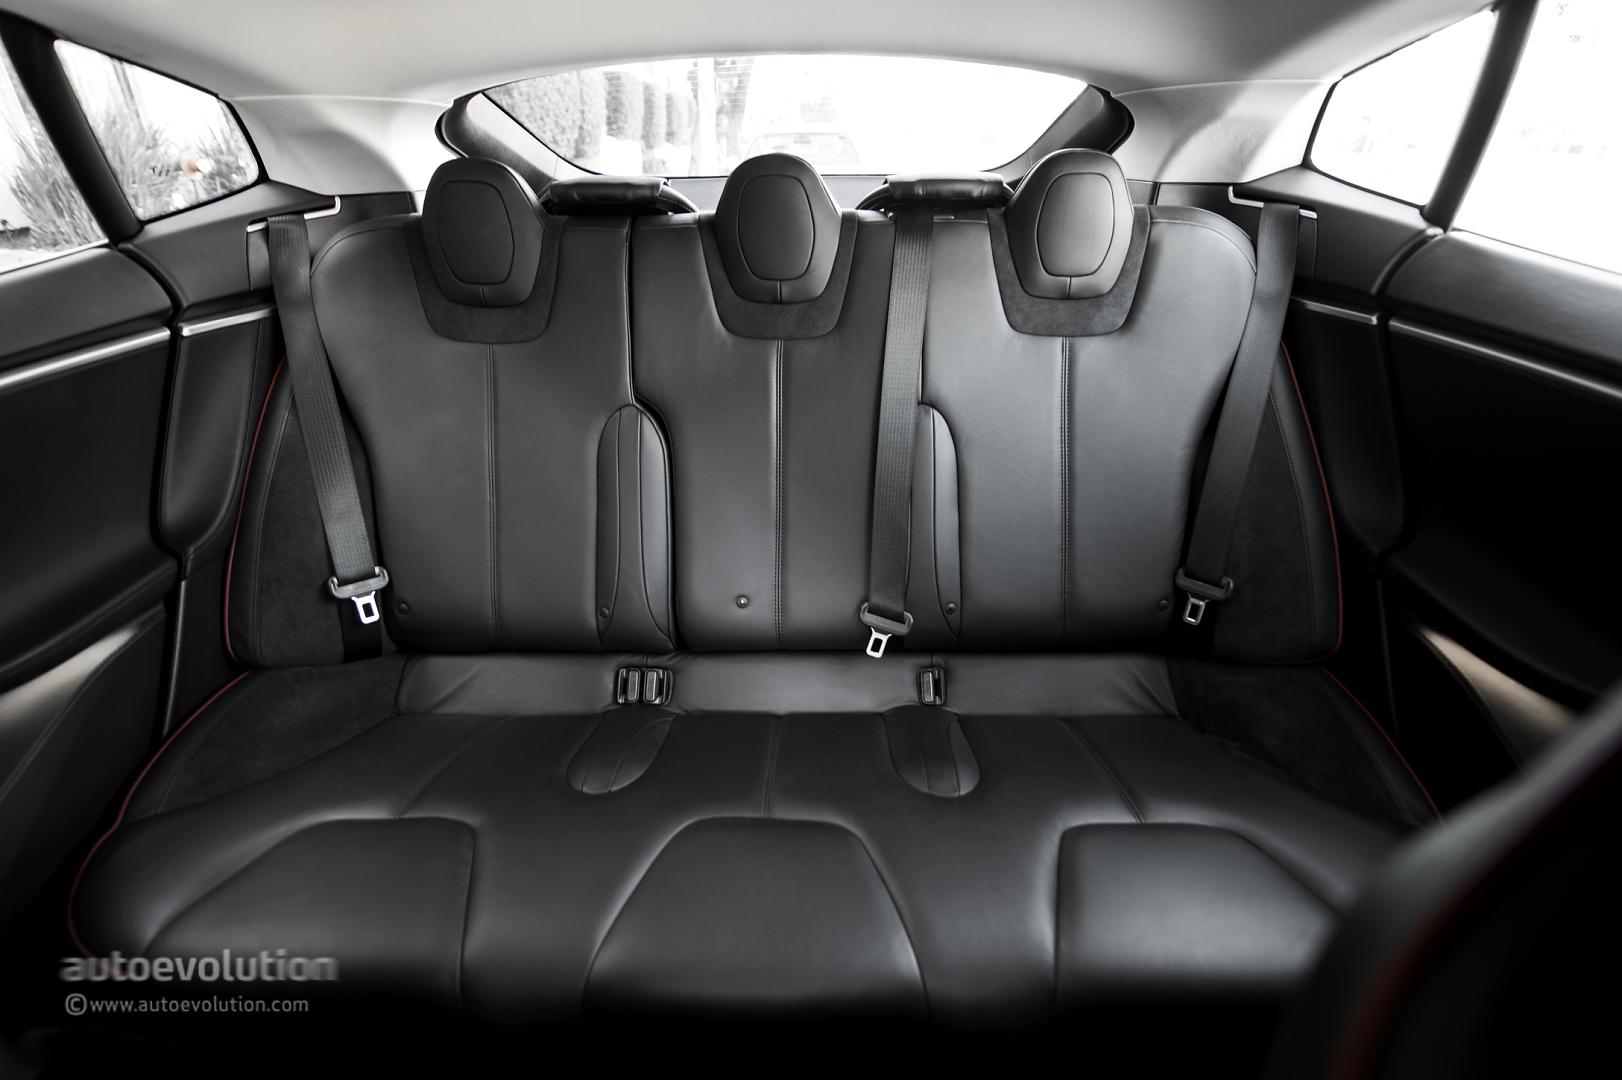 Vauxhall Zafira Baby Car Seats